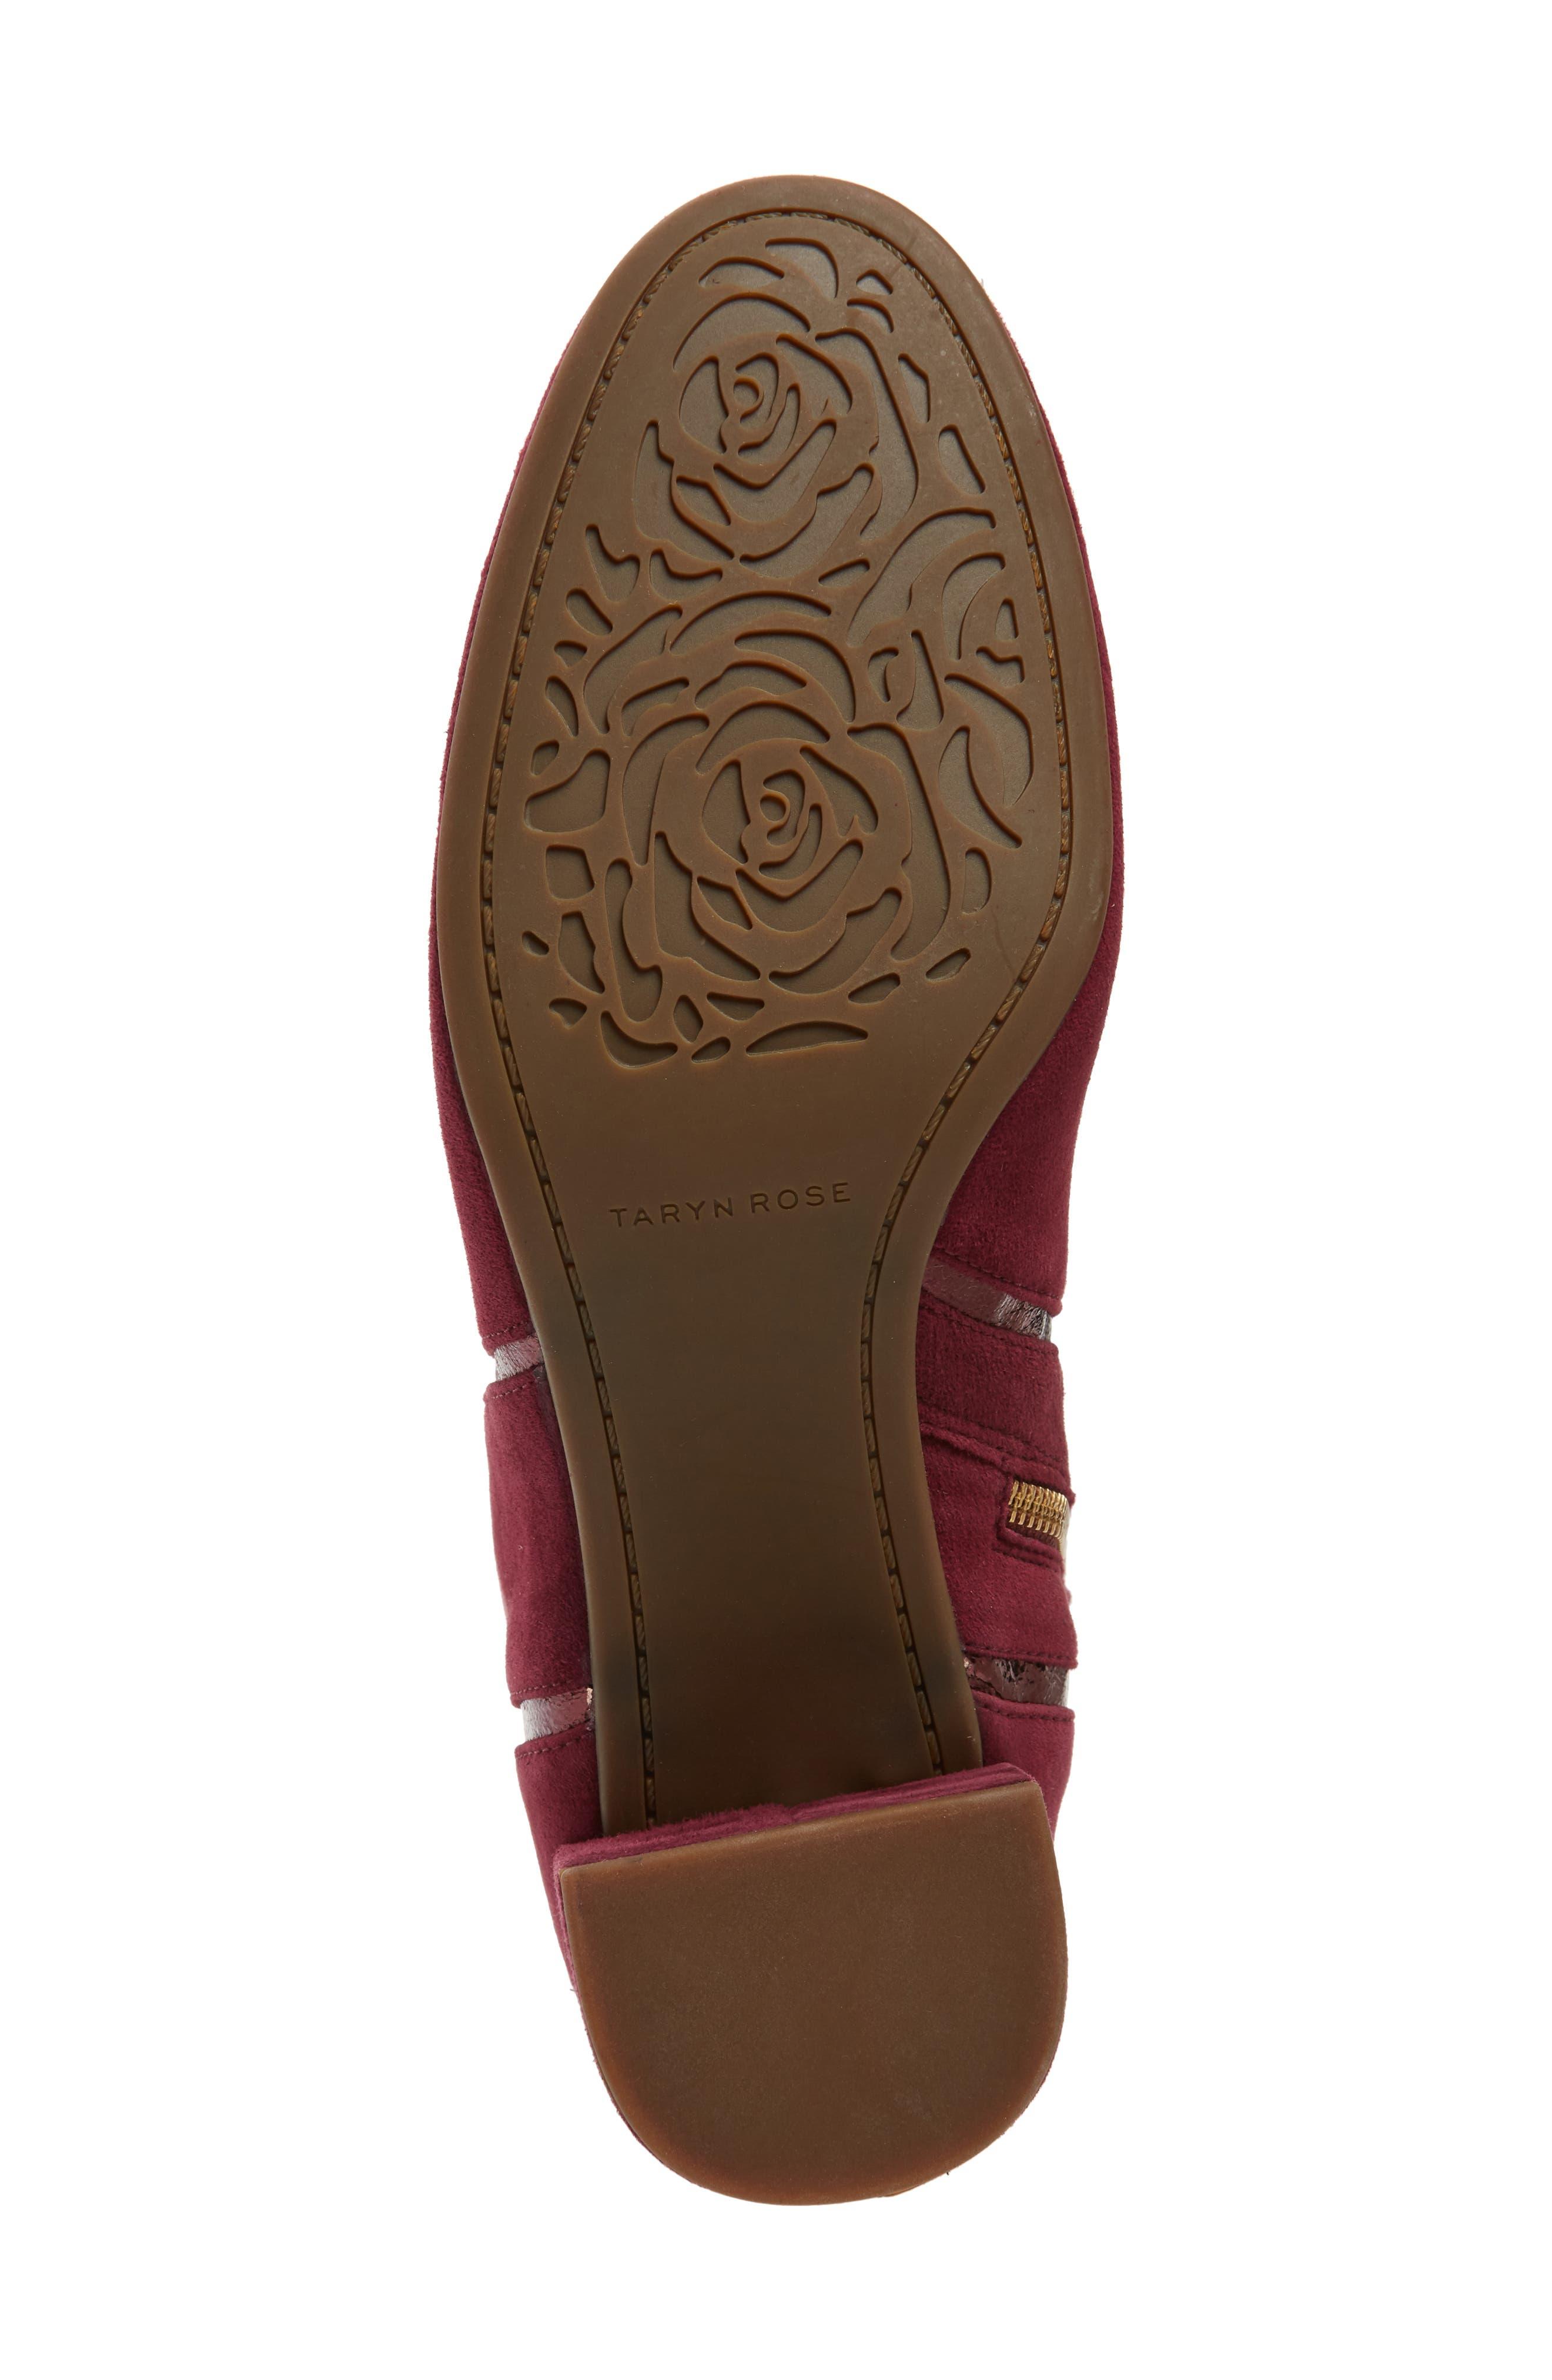 TARYN ROSE, Charlee Knee High Boot, Alternate thumbnail 6, color, FIG SUEDE